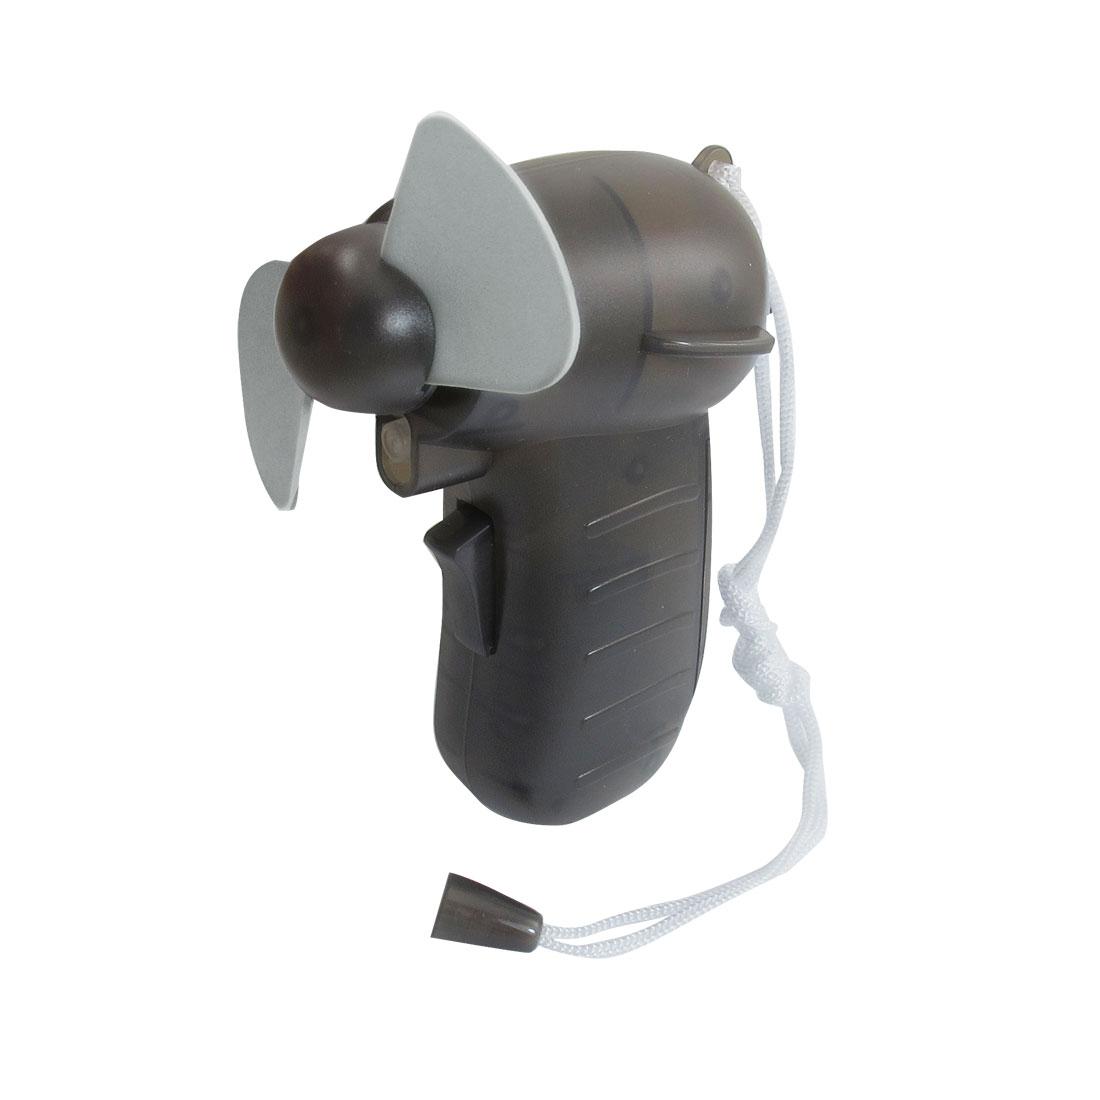 Black Gun Shape Plastic Cover Battery Household Water Spray Mini Fan